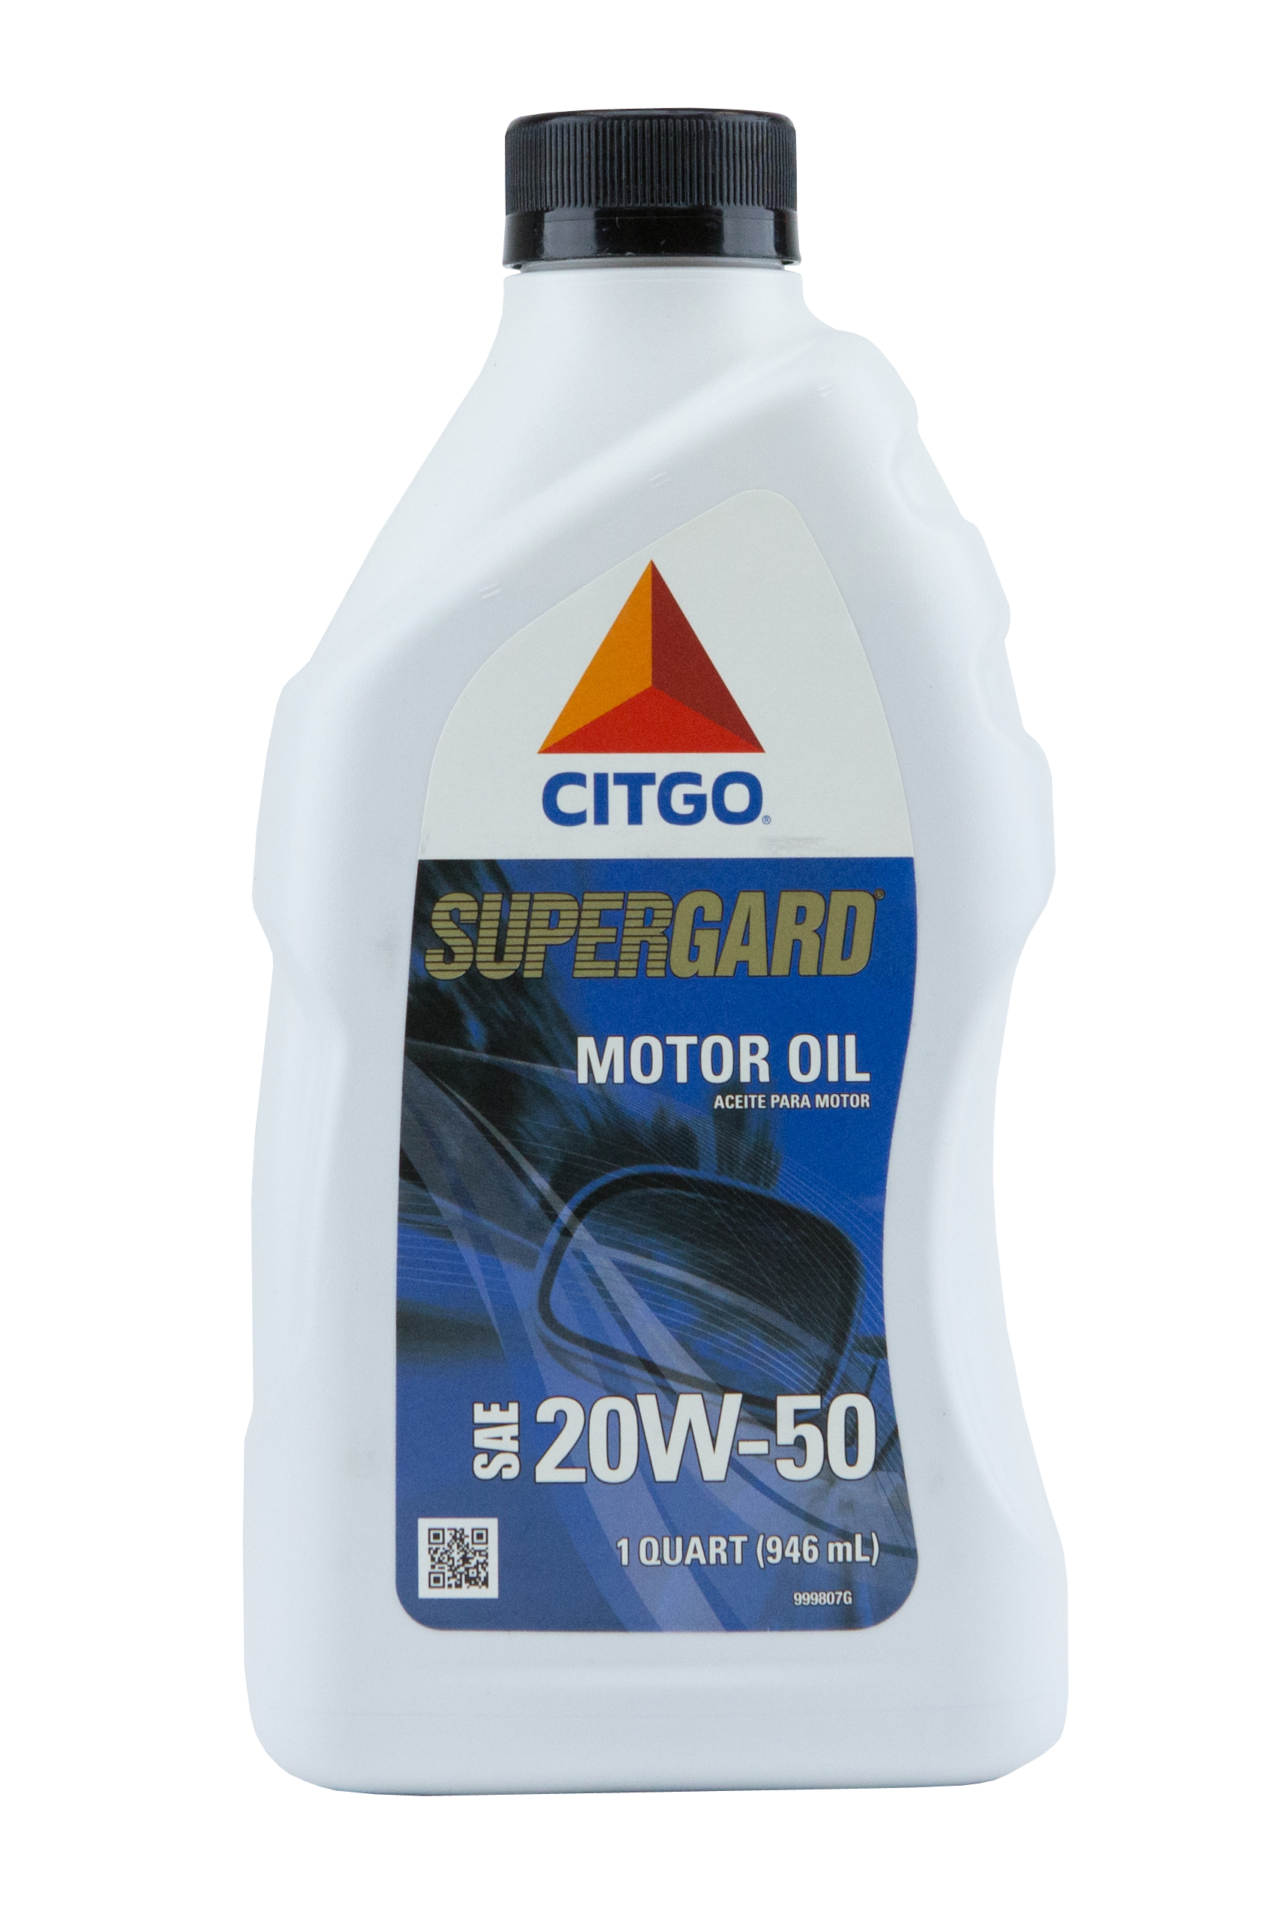 Buy Citgo Supergard 20w50 Motor Oil 12 1 Qts Case